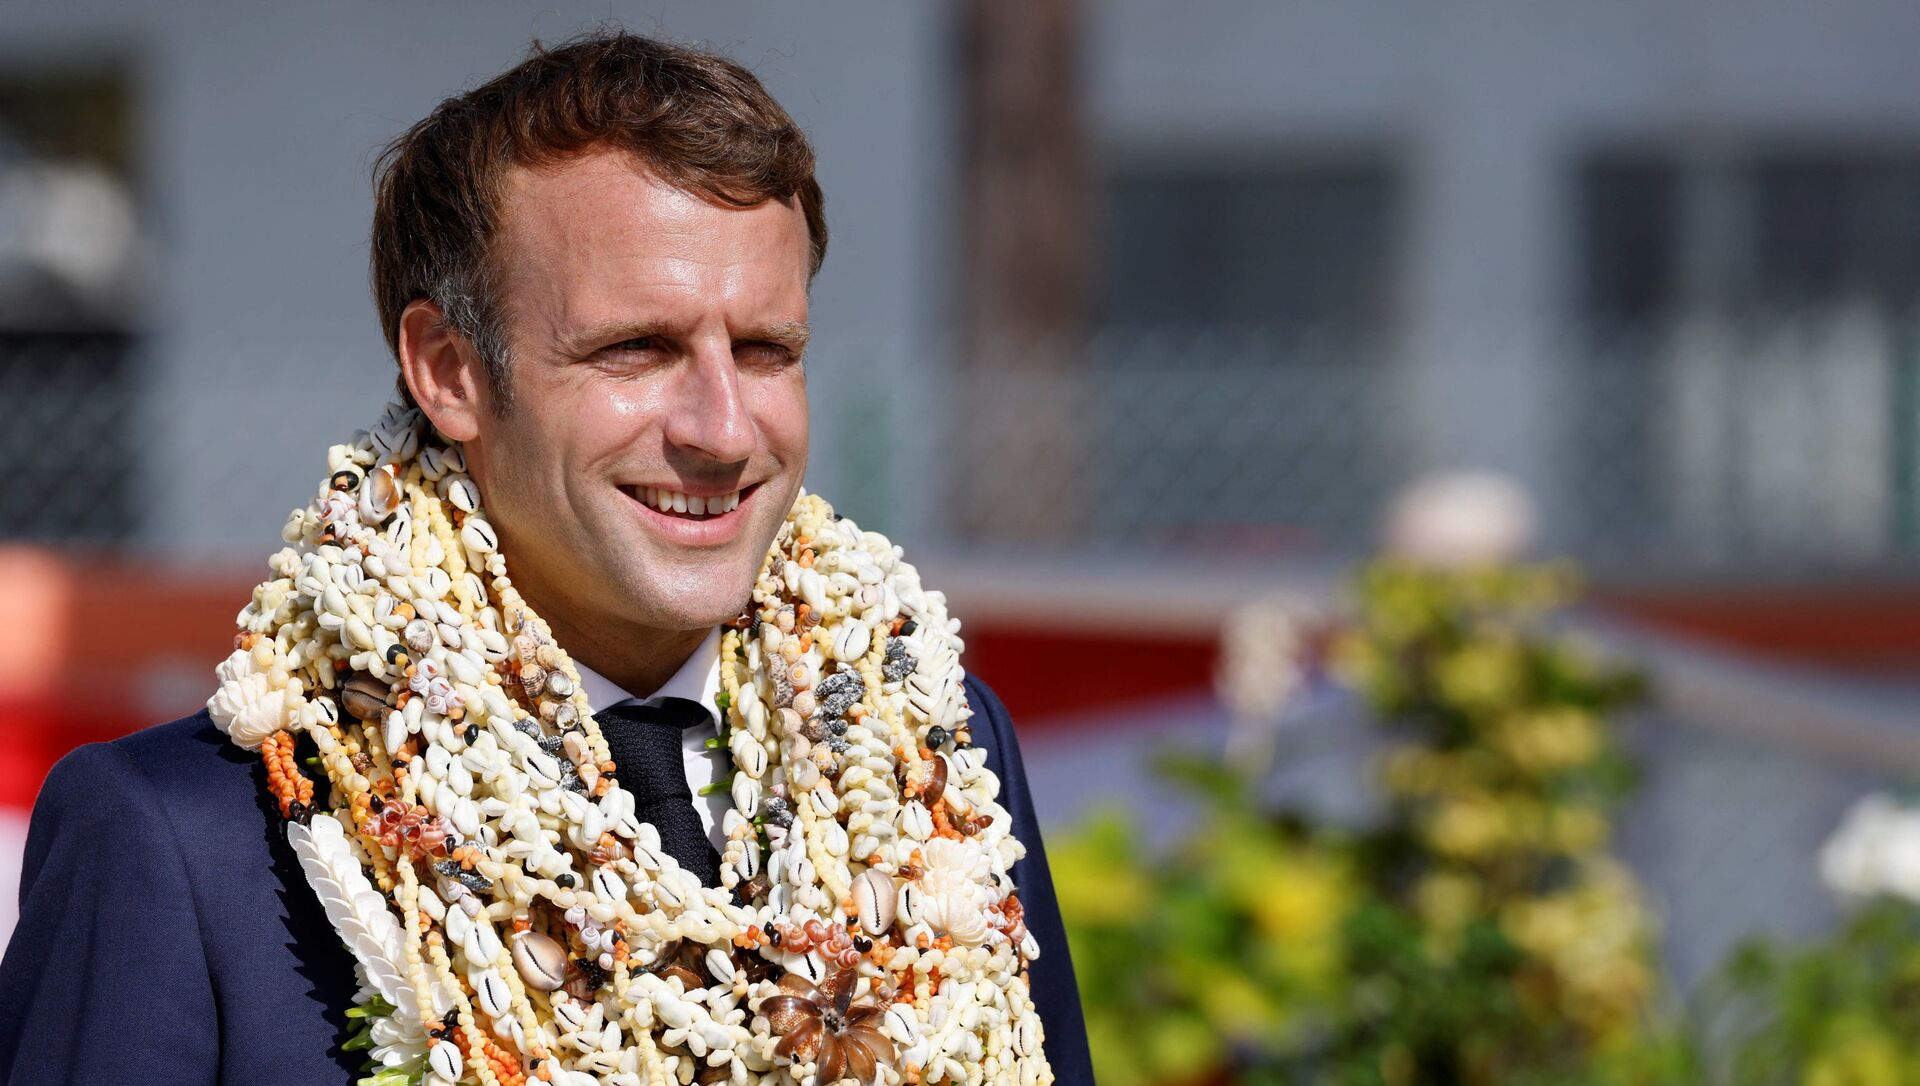 Emmanuel Macron en visite en Polynésie française, le 26 juillet - Sputnik France, 1920, 27.07.2021